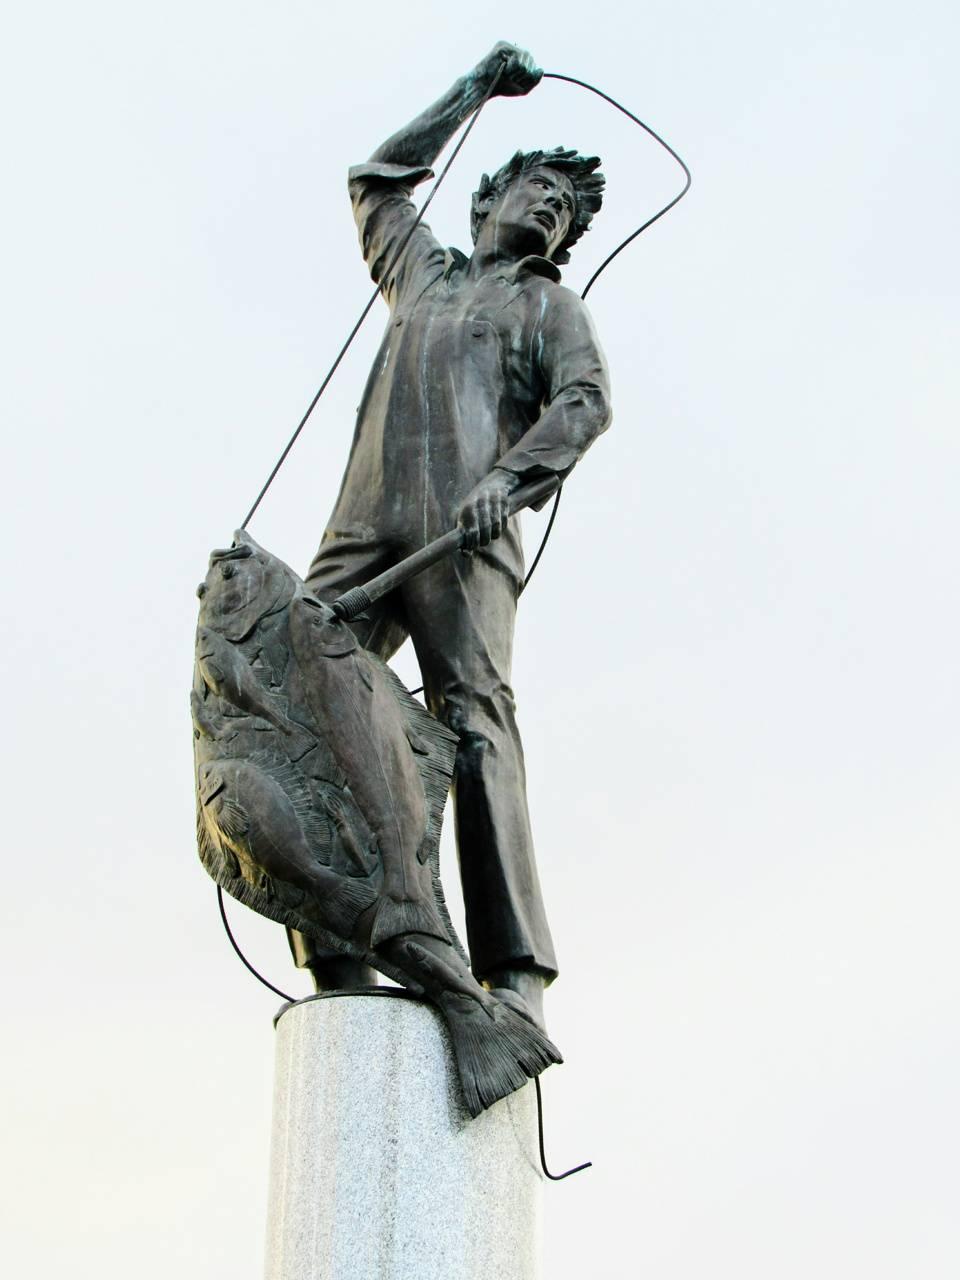 SeattleHarbor statue